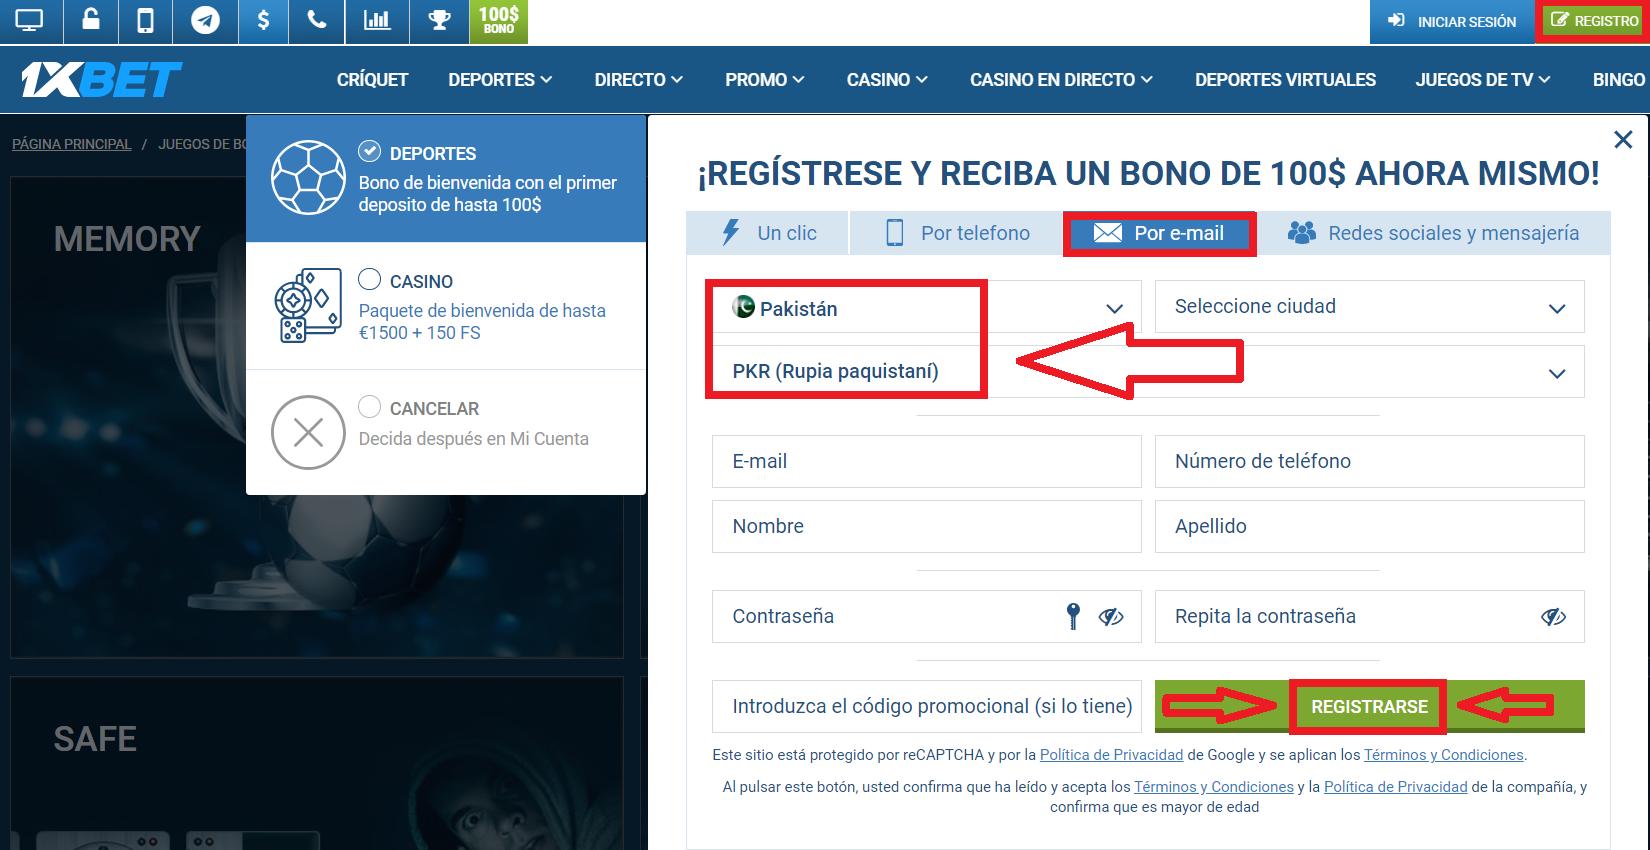 1xBet Registration using Existing Social Media Account